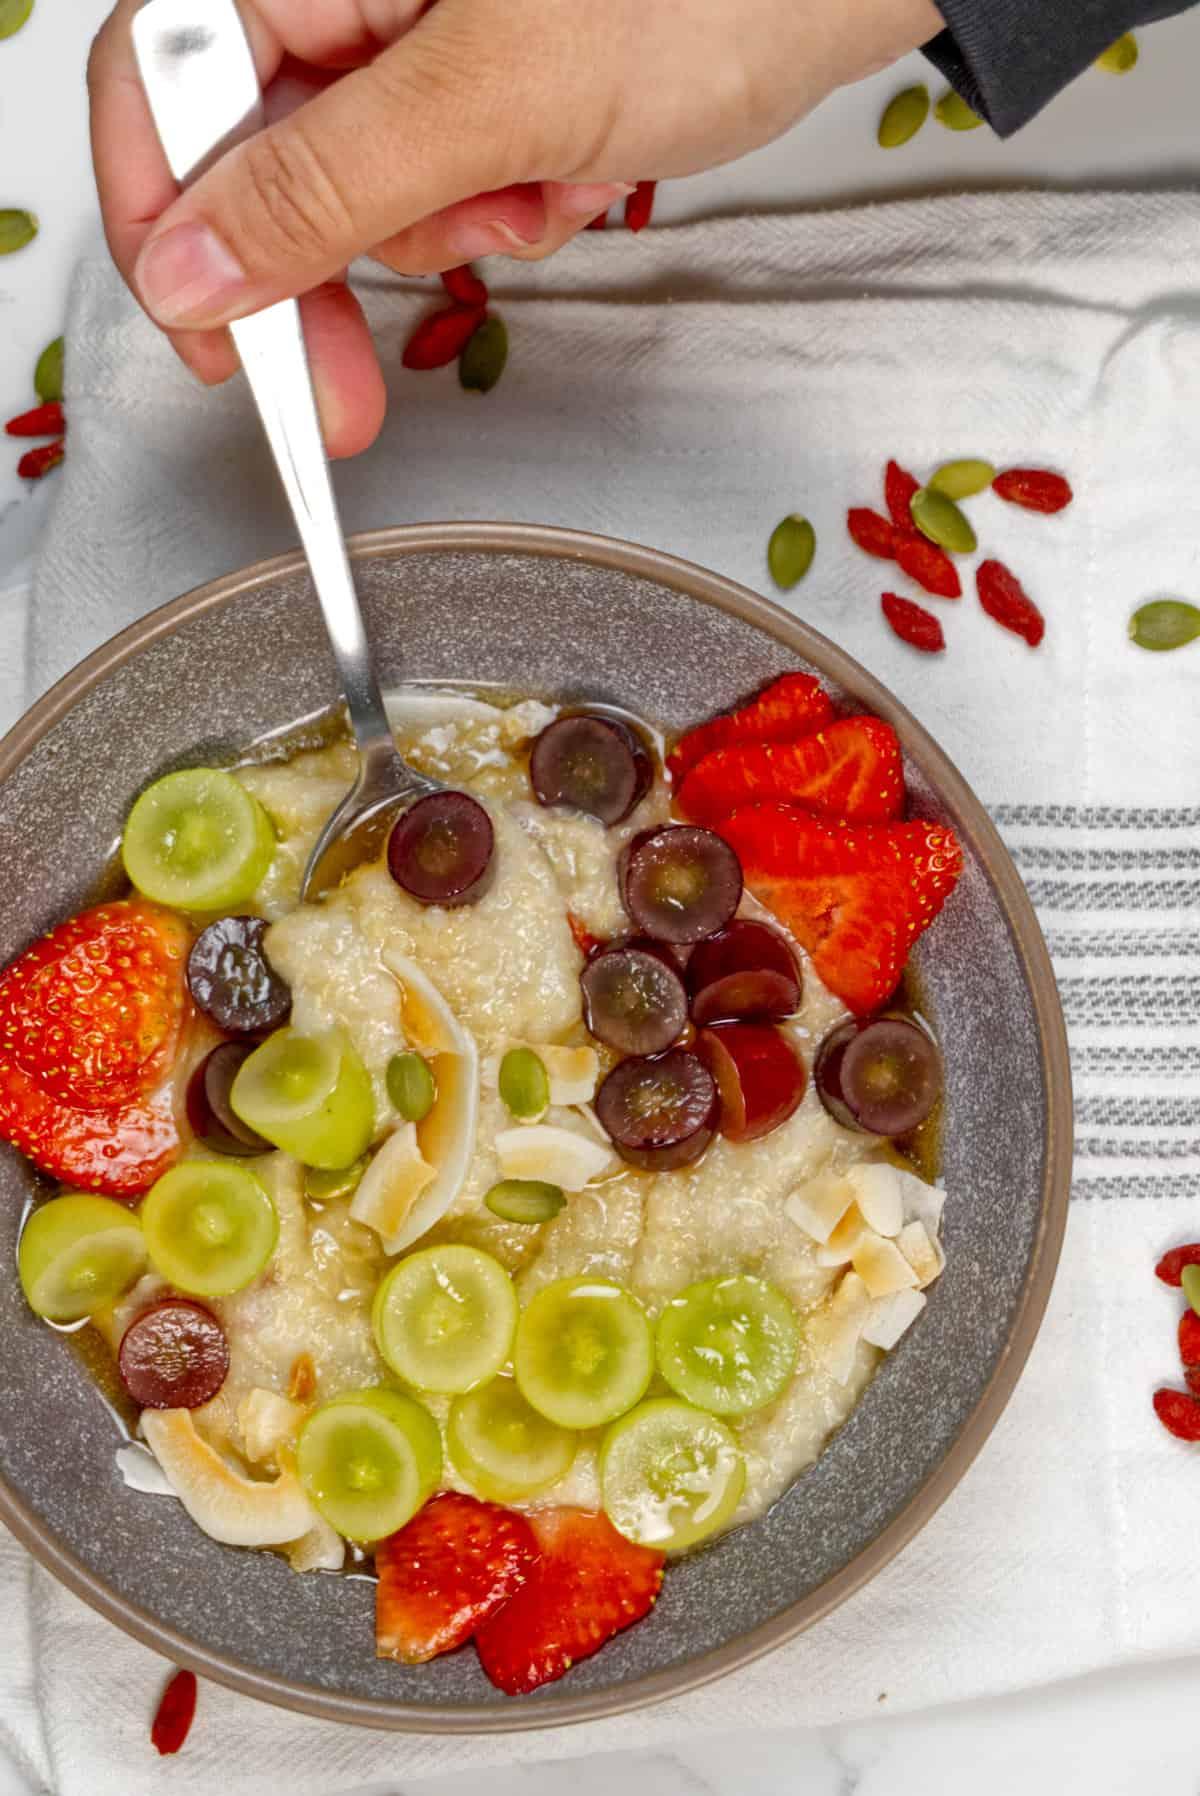 quinoa flakes porridge in a bowl being spooned